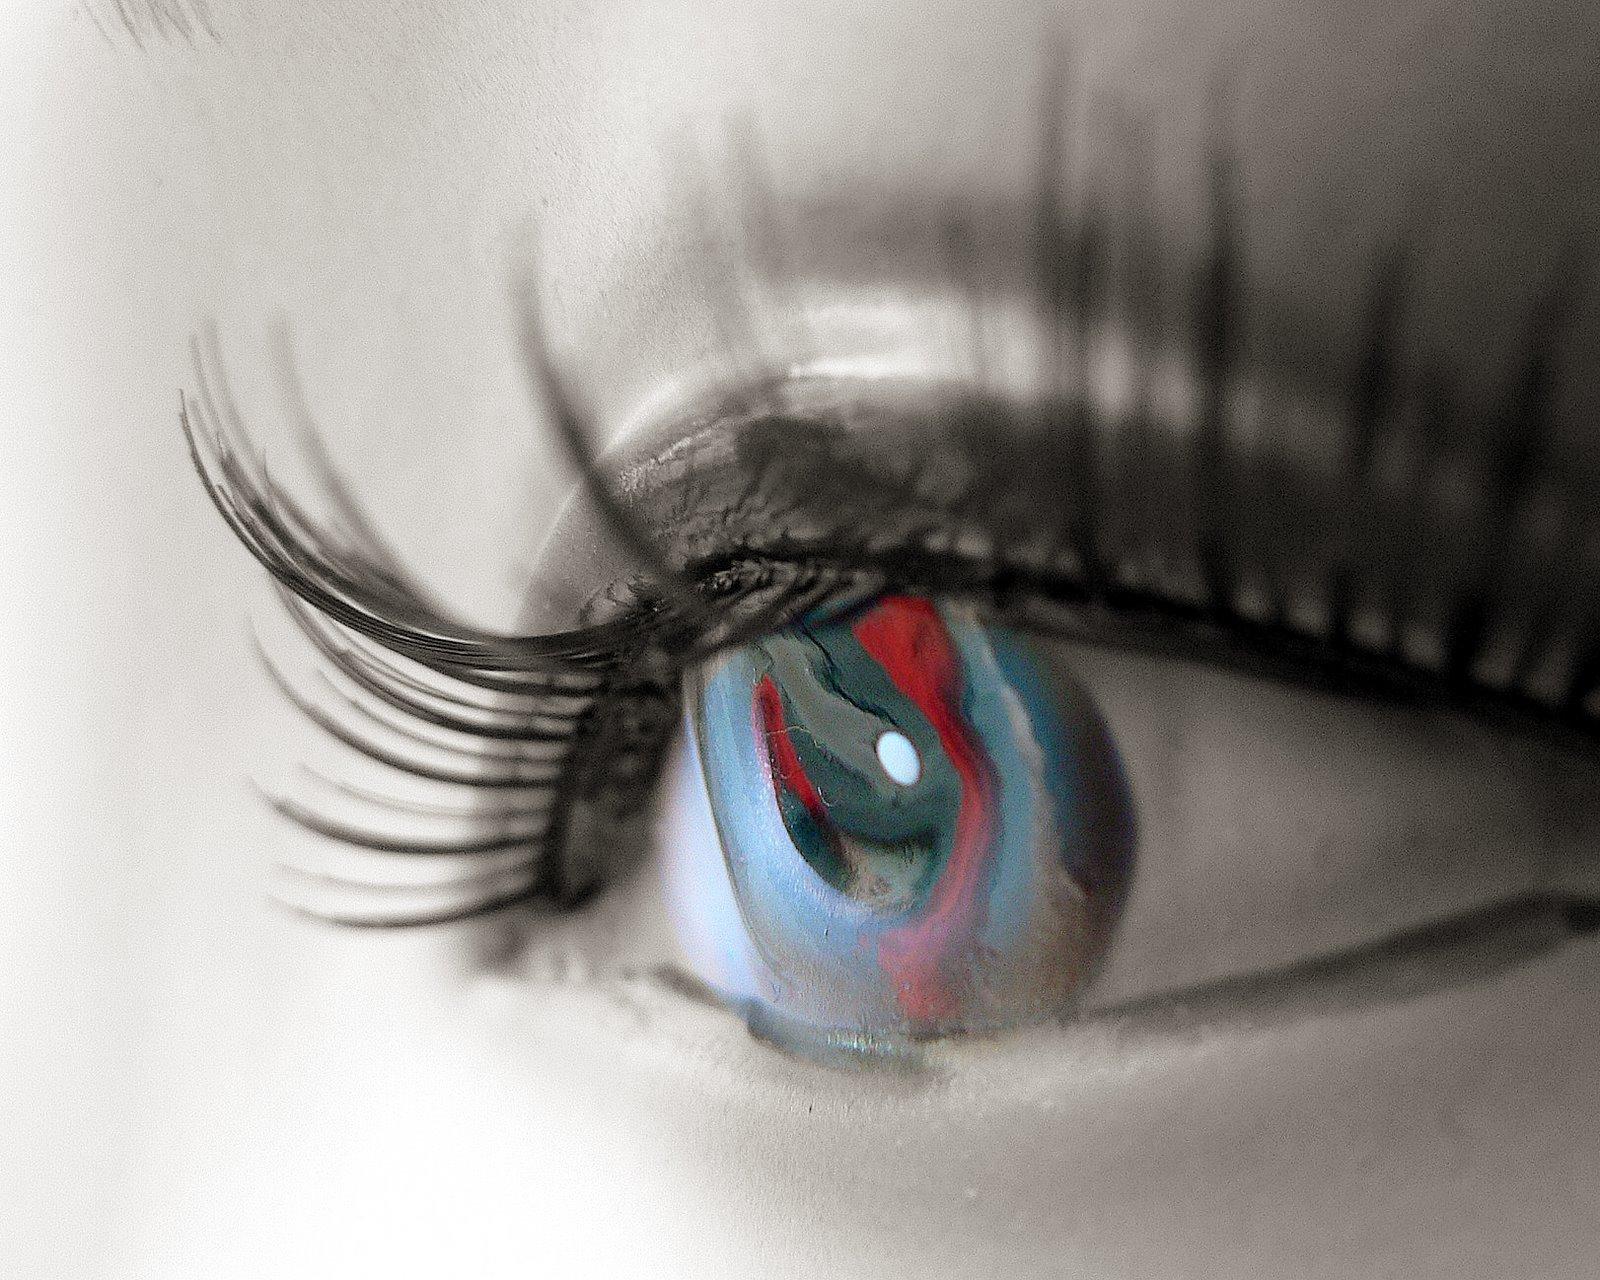 [ojo-maniqui1.jpg]